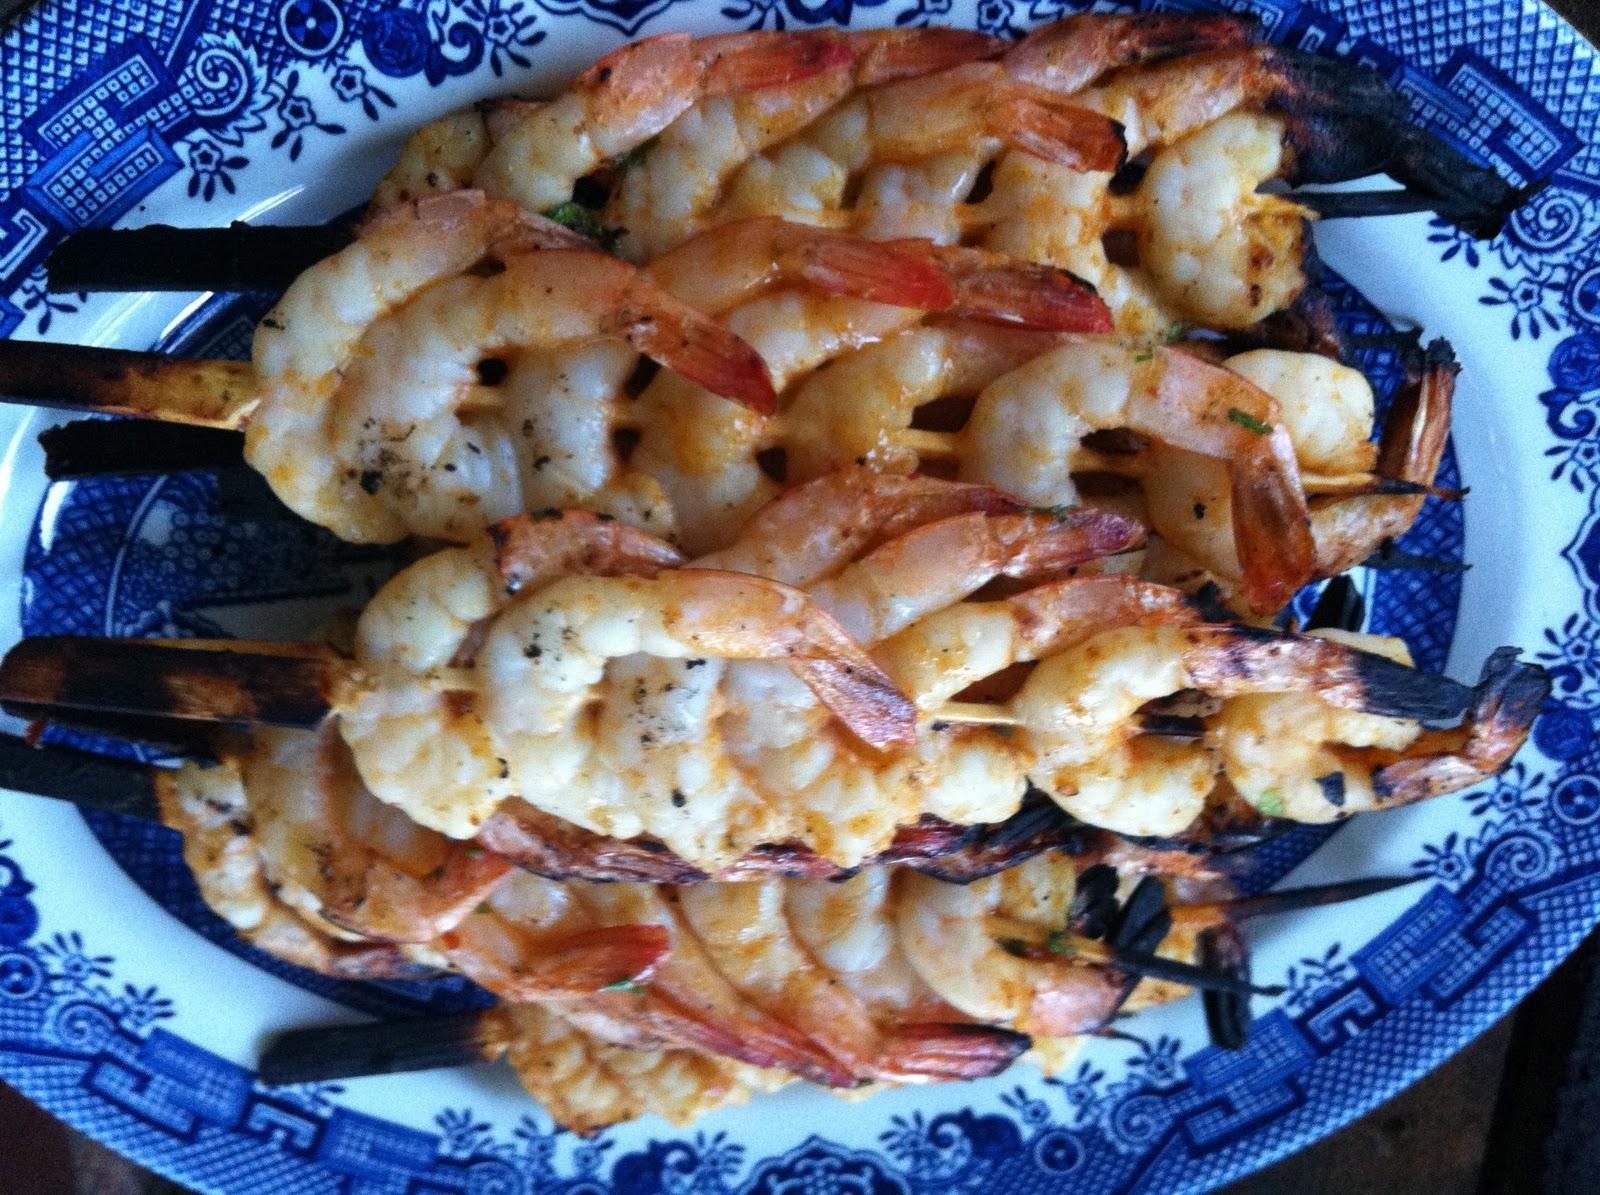 Zine: Portugal - BBQ Piri Piri Prawns with Tomato Rice